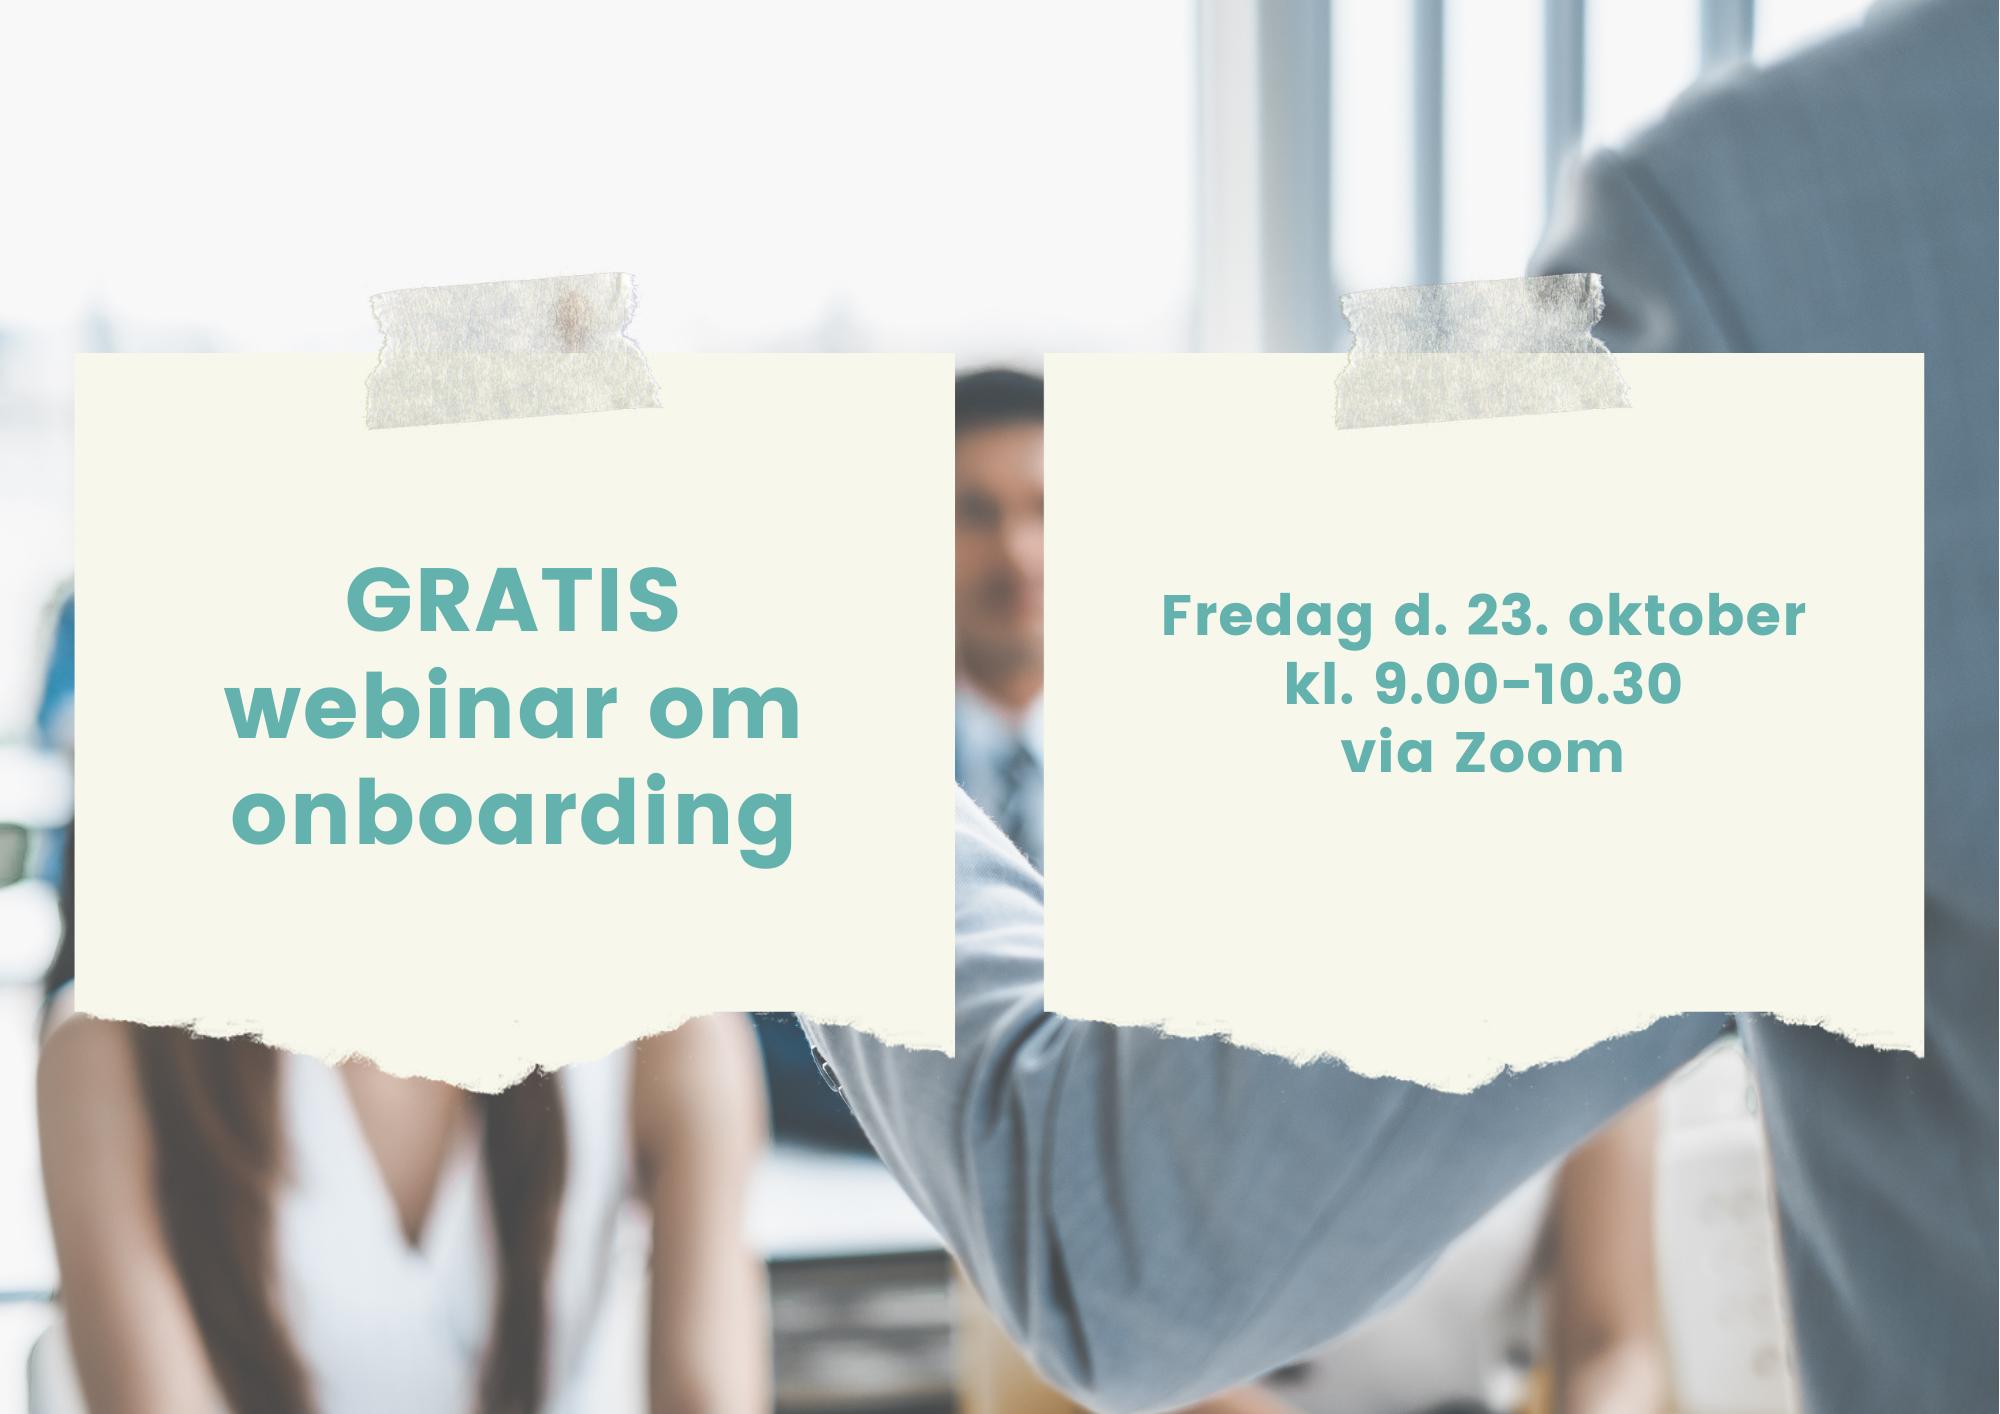 GRATIS Webinar om onboarding